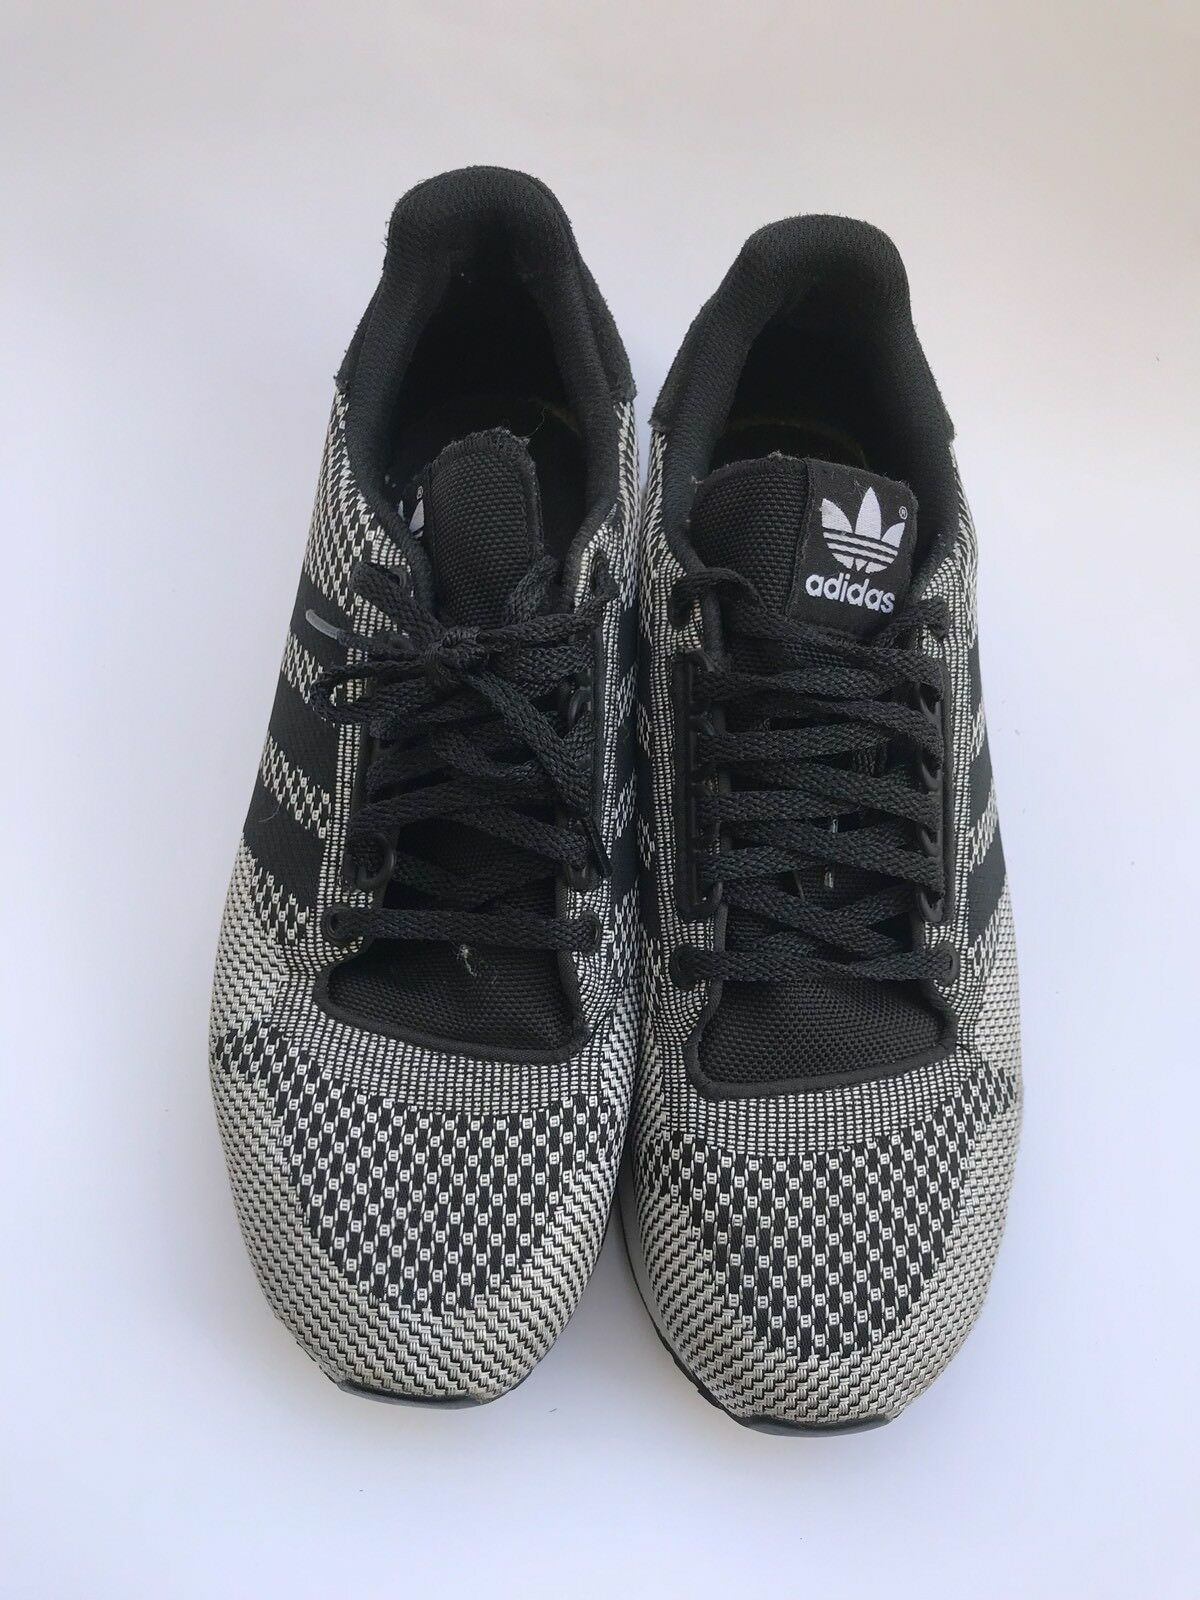 Adidas zx 500 10 og Weave Negro Gris 10 500 zapatillas de deporte de hombre usado buen estado 671843